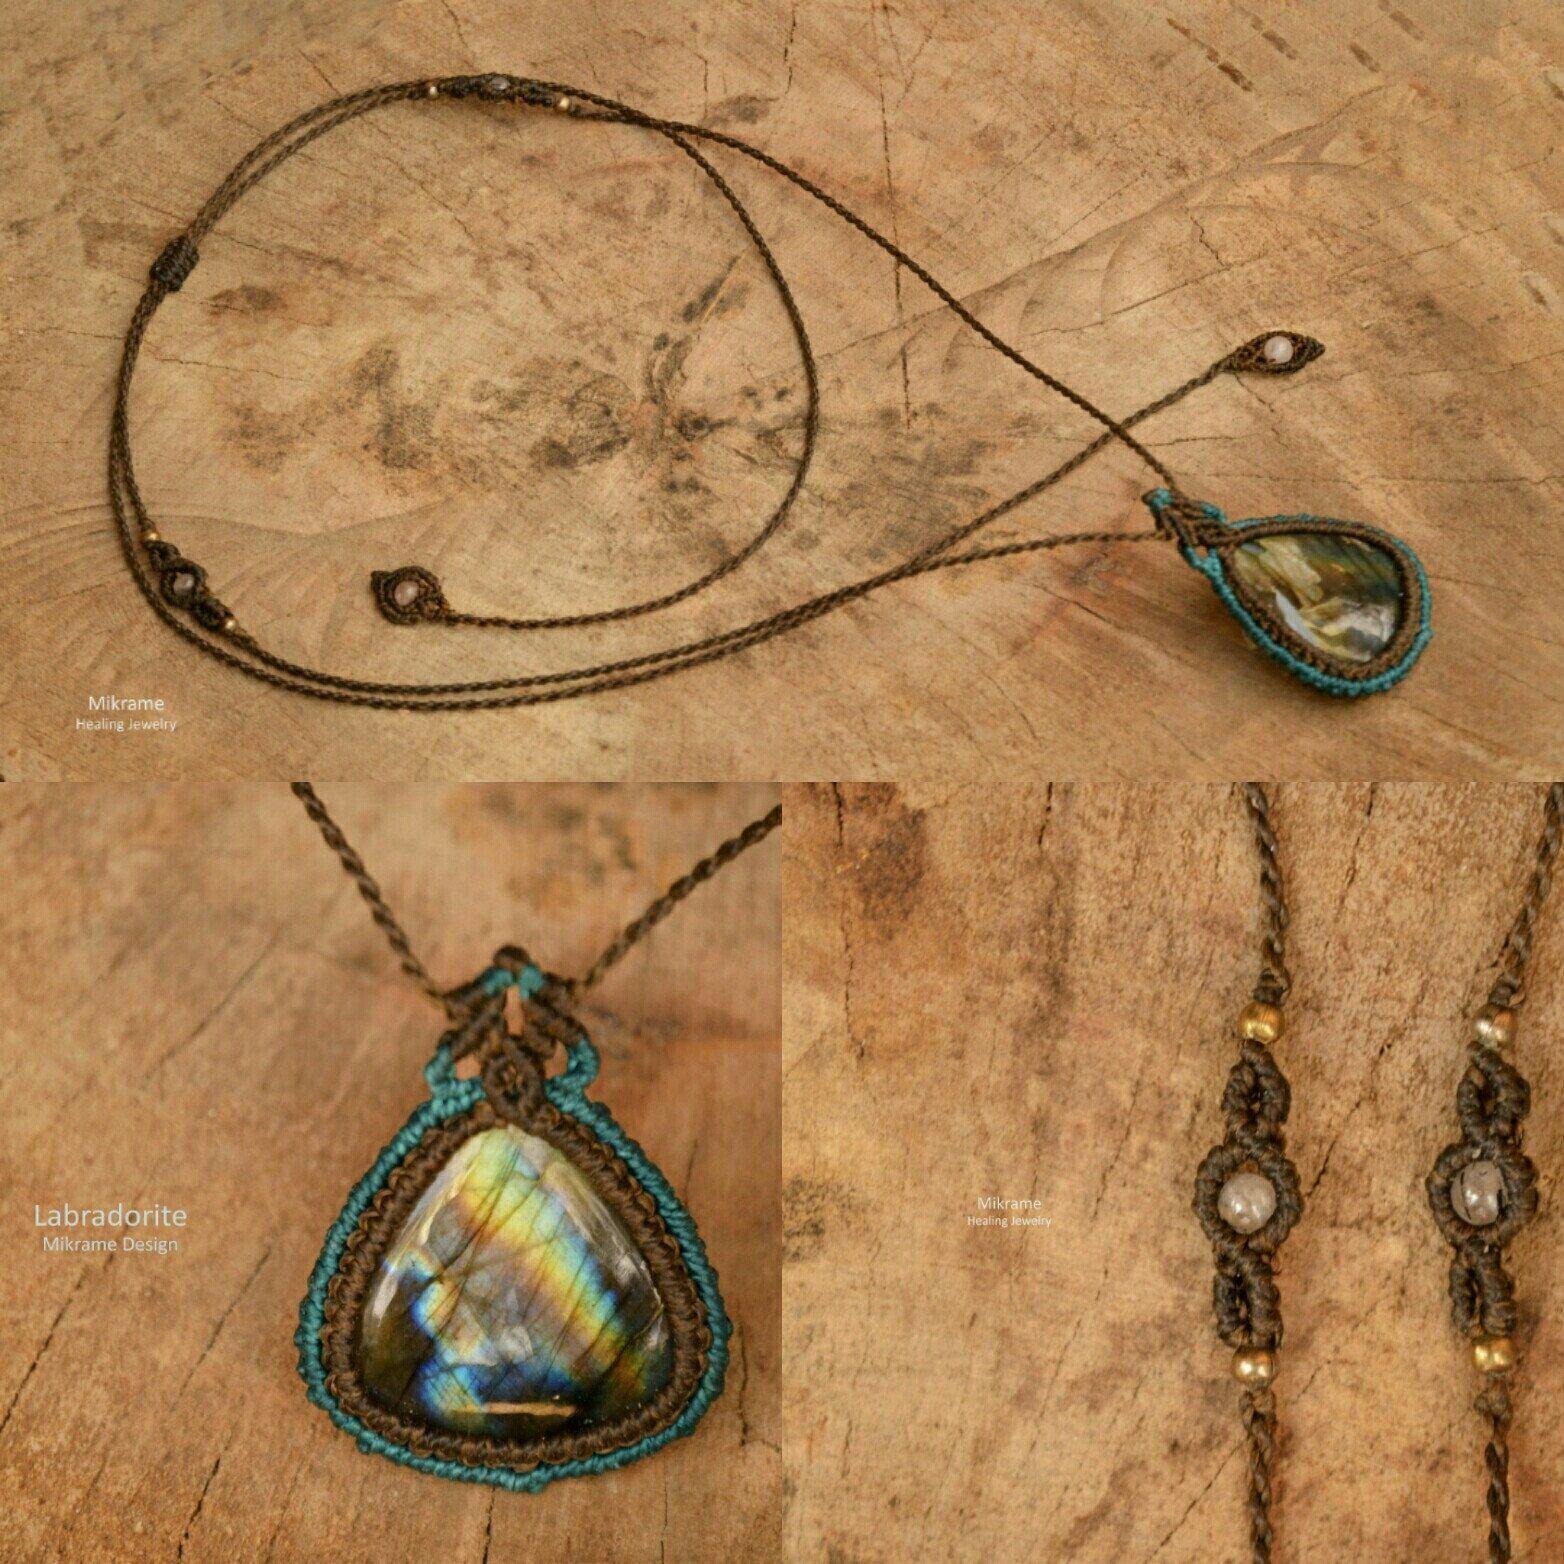 Chevron Necklace,Choker Necklace,Macrame Necklace,Layering Necklace,Macrame Jewelry,Gemstone Choker,Birthstone,Quartz Pendant,Minimalist